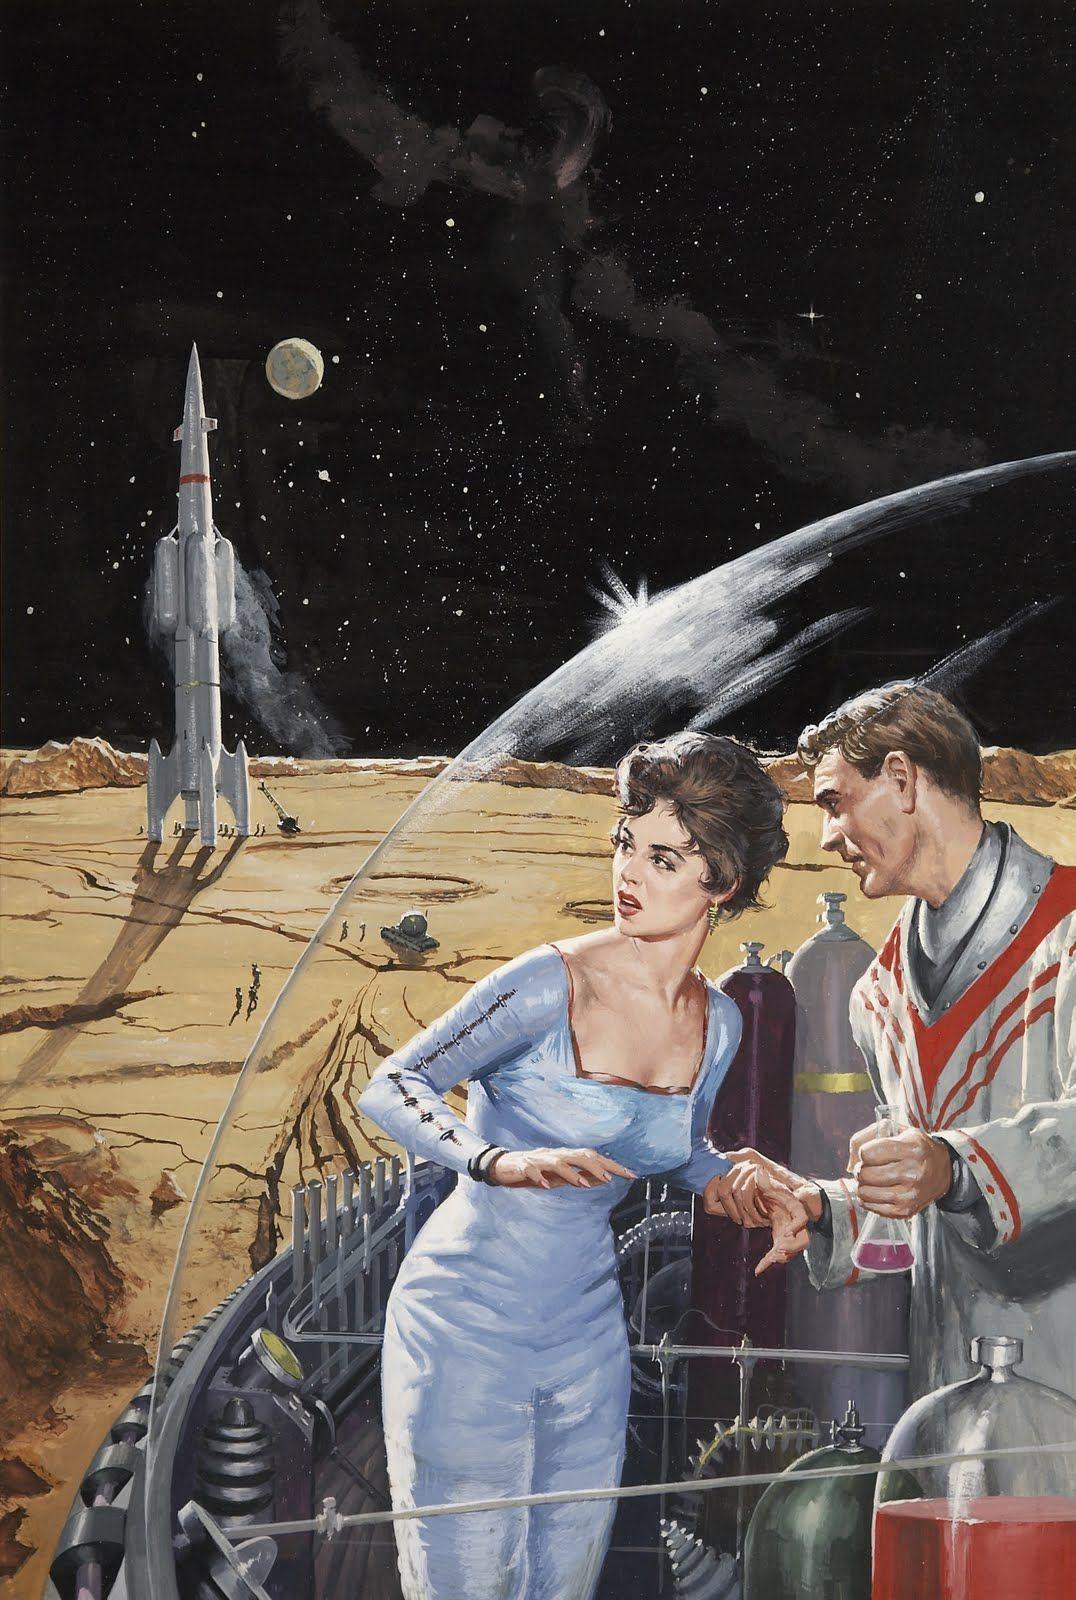 Robert Schulz - The Tomorrow People by Judith Merrill, 1960